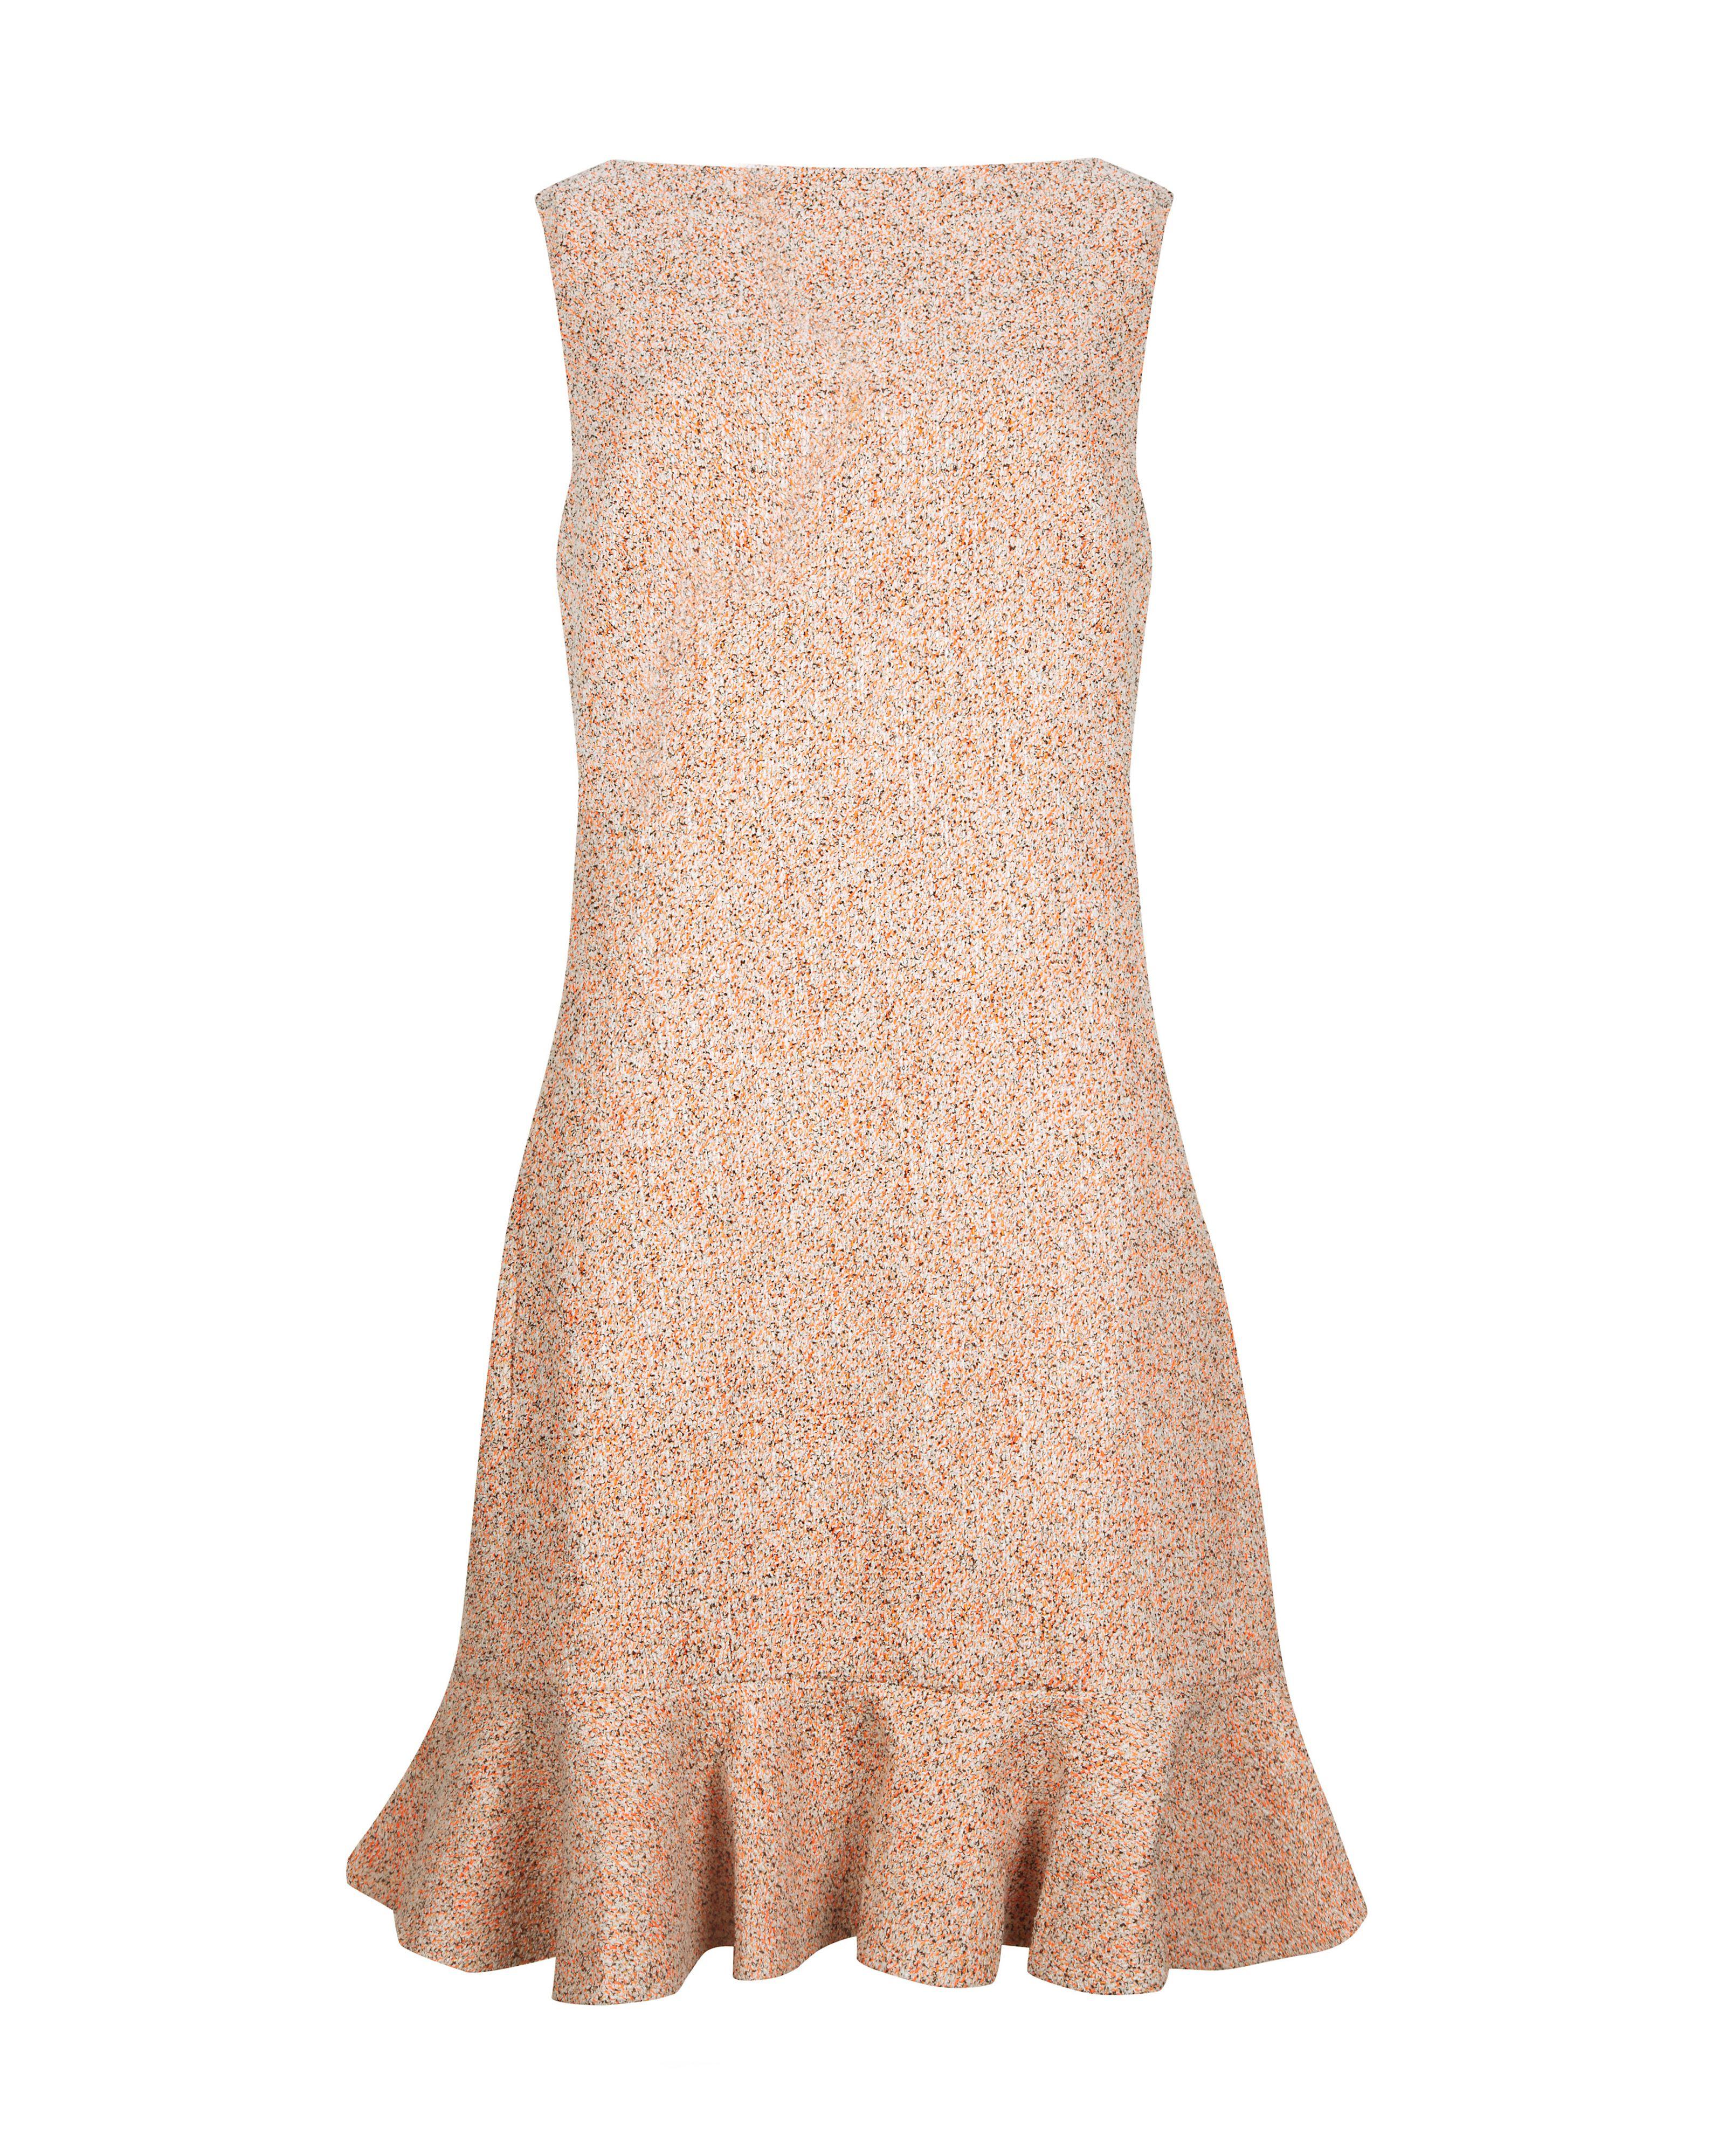 Frilled Hem Dress Ted Baker W4Cn8f